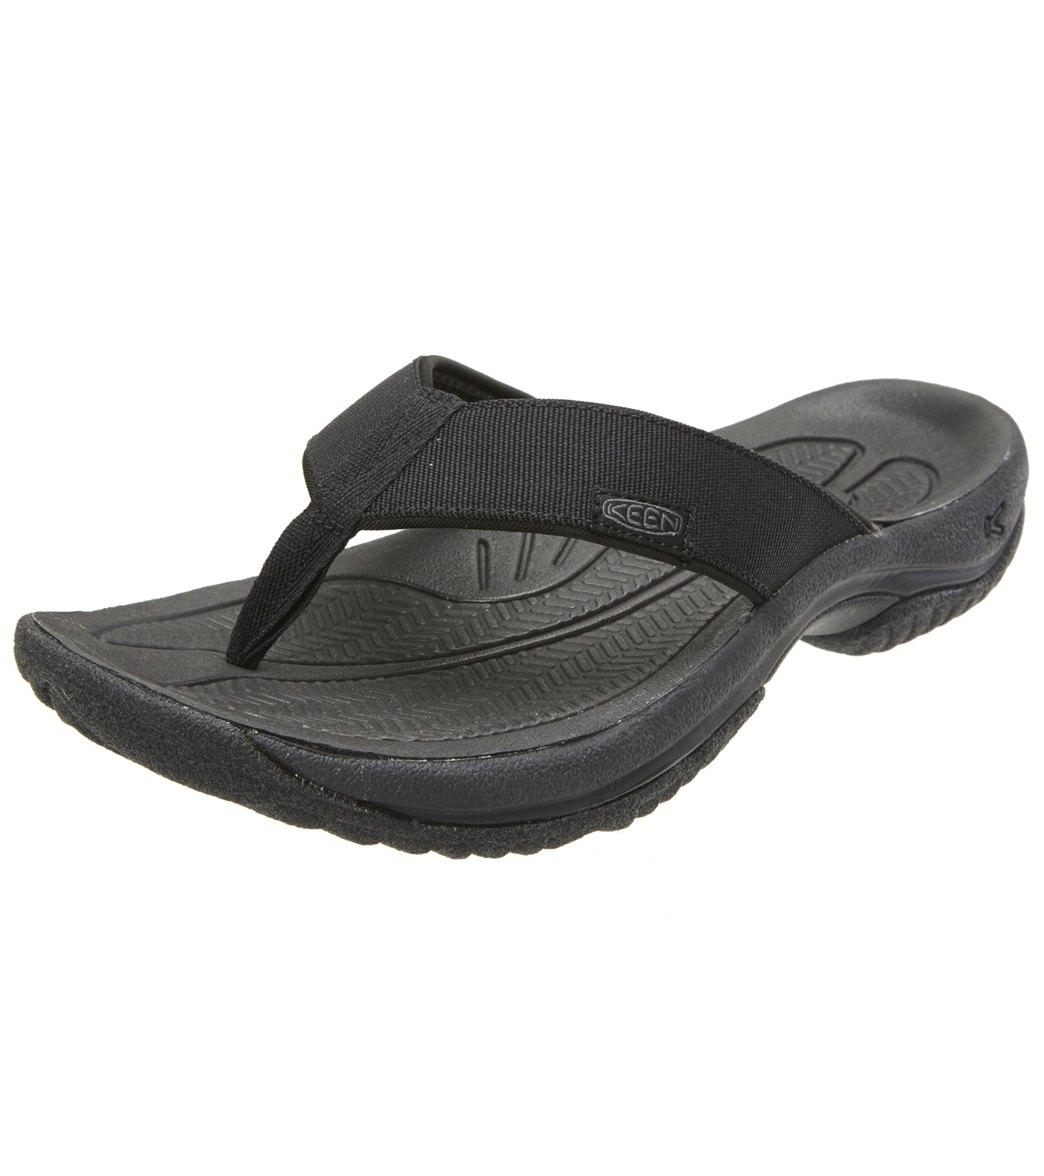 2a8a48d67d0cf5 Keen Men s Kona Flip Flop at SwimOutlet.com - Free Shipping